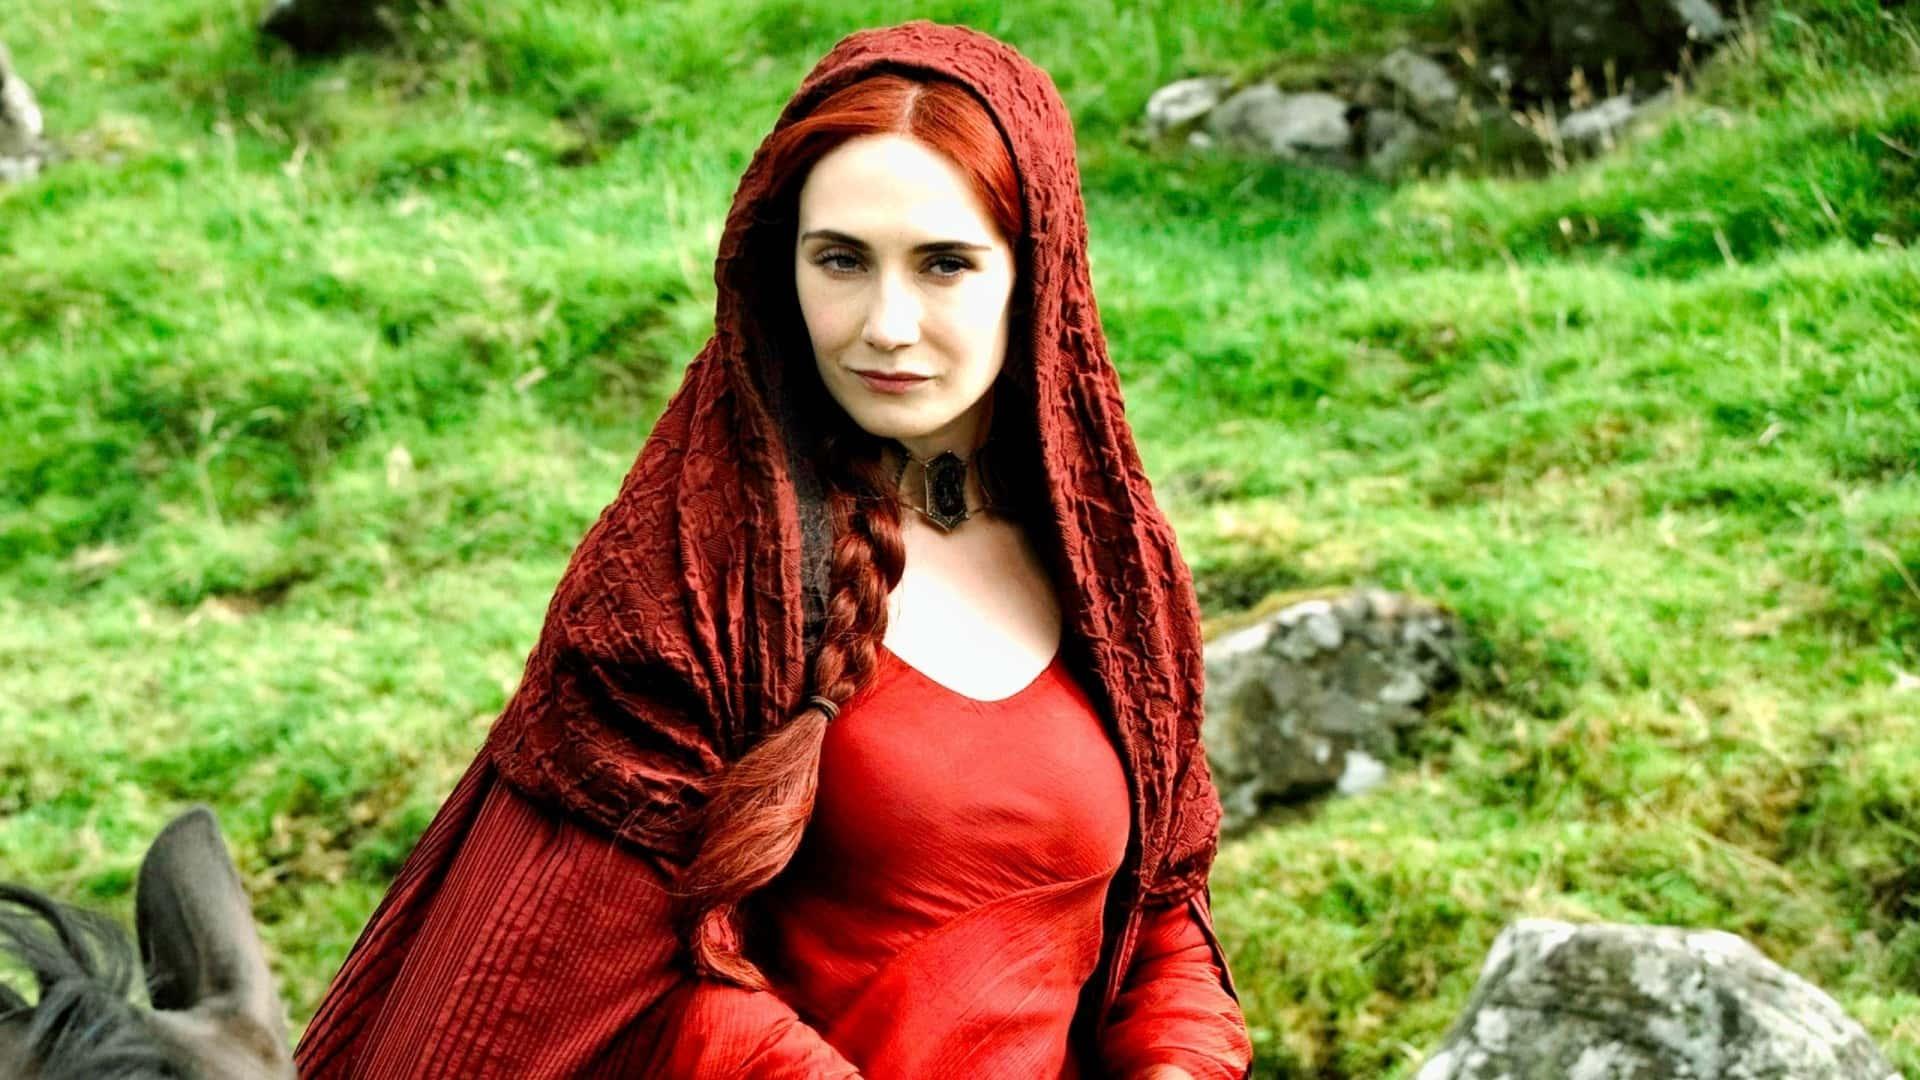 Melisandre facts